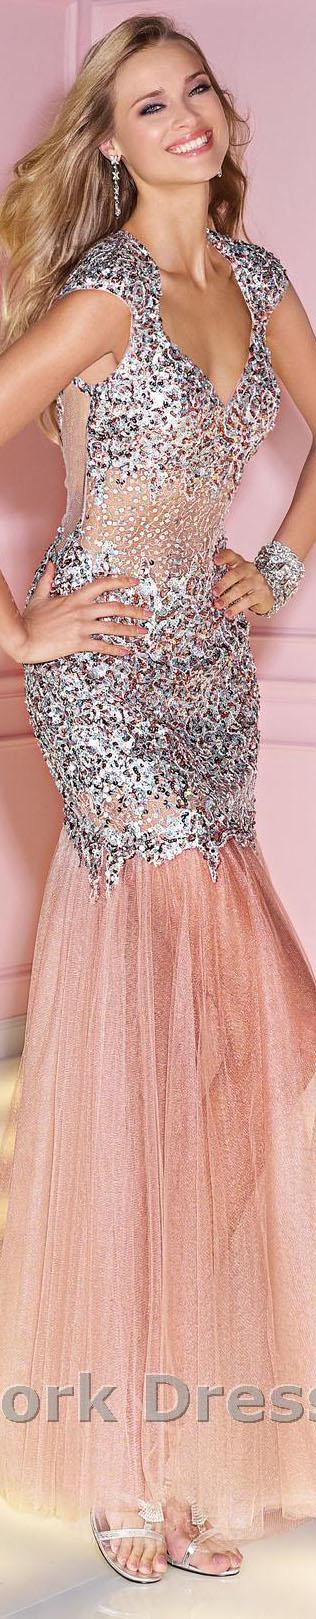 Alyce Paris design #large #formal #sparkly #silver #pink #dress ...